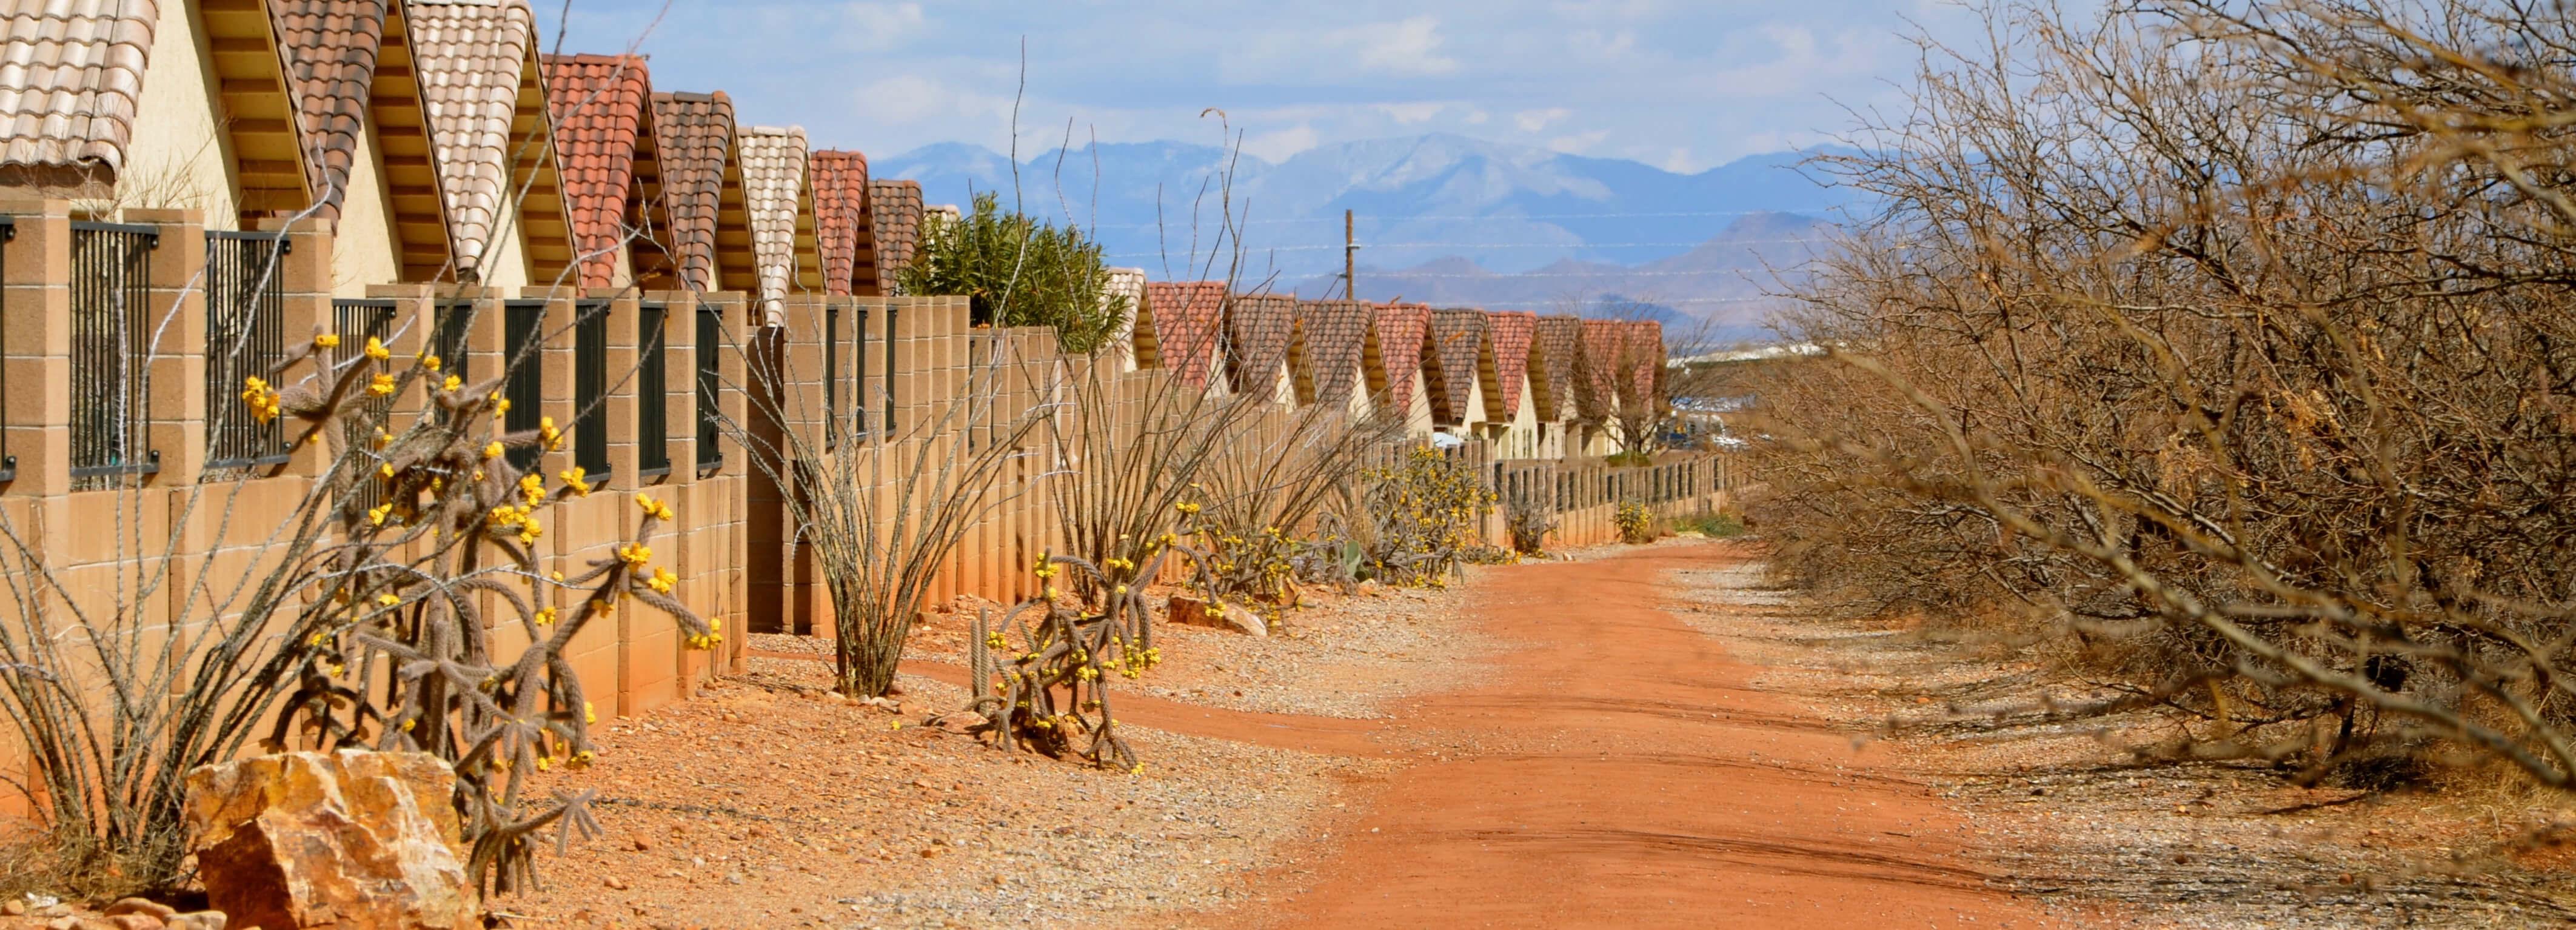 desert walk way